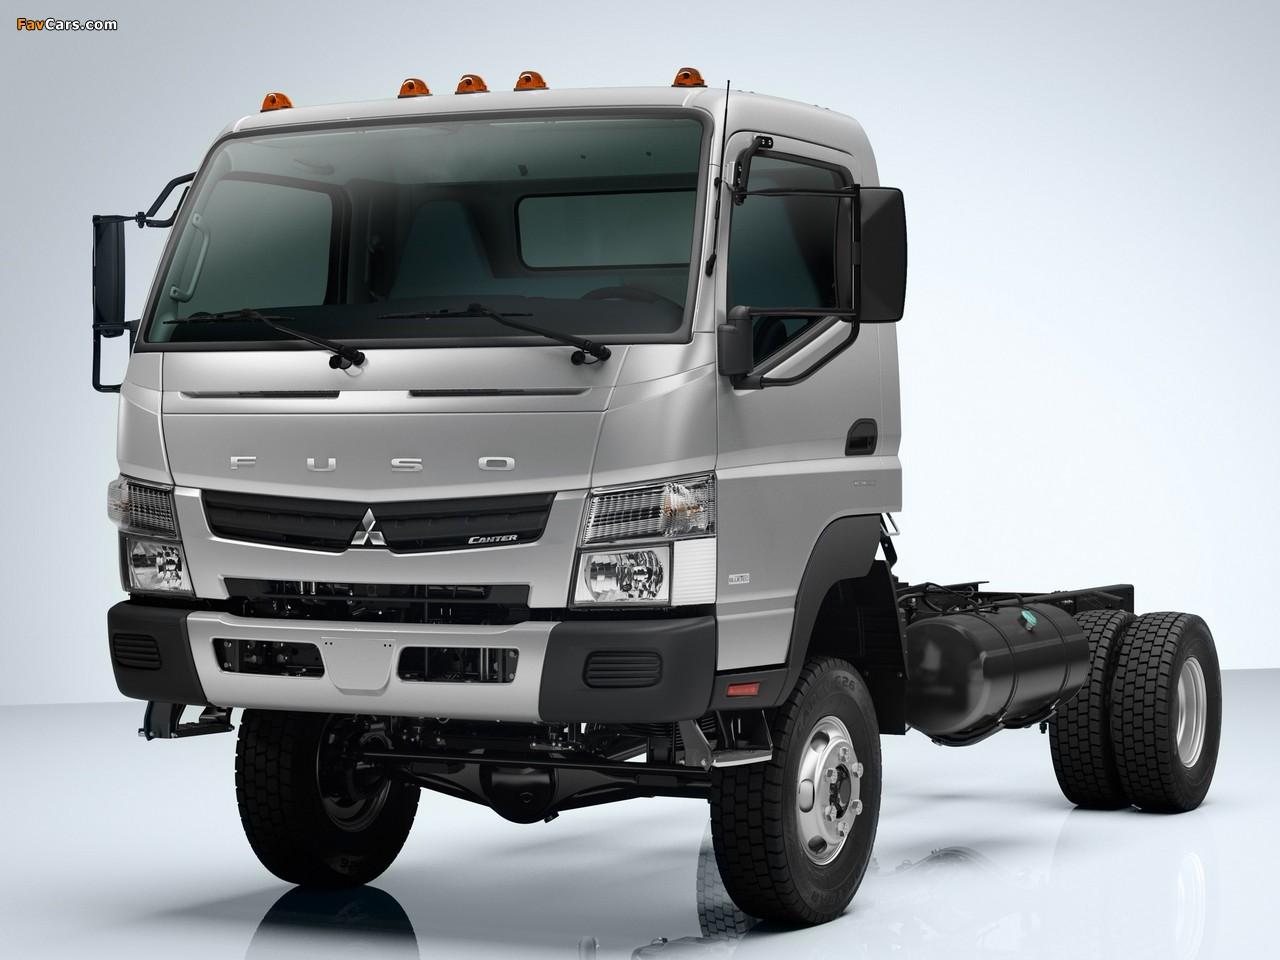 Mitsubishi Fuso Canter 6C18 US-spec (FG7) 2011 photos (1280 x 960)